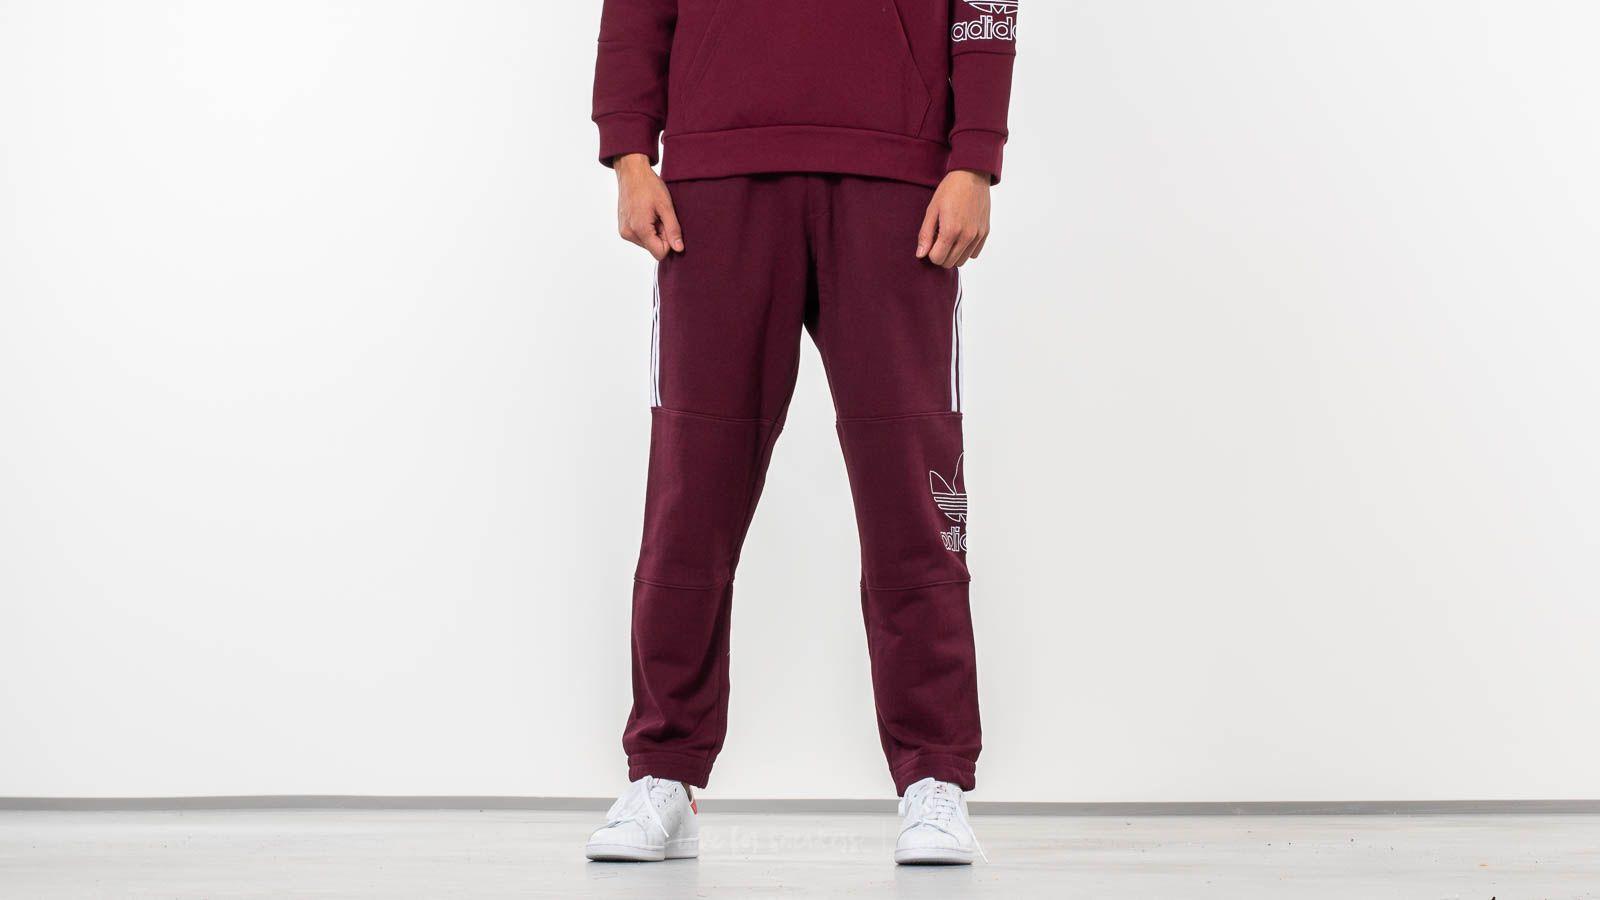 adidas Originals Outline Pants Maroon za skvělou cenu 1 280 Kč koupíte na Footshop.cz